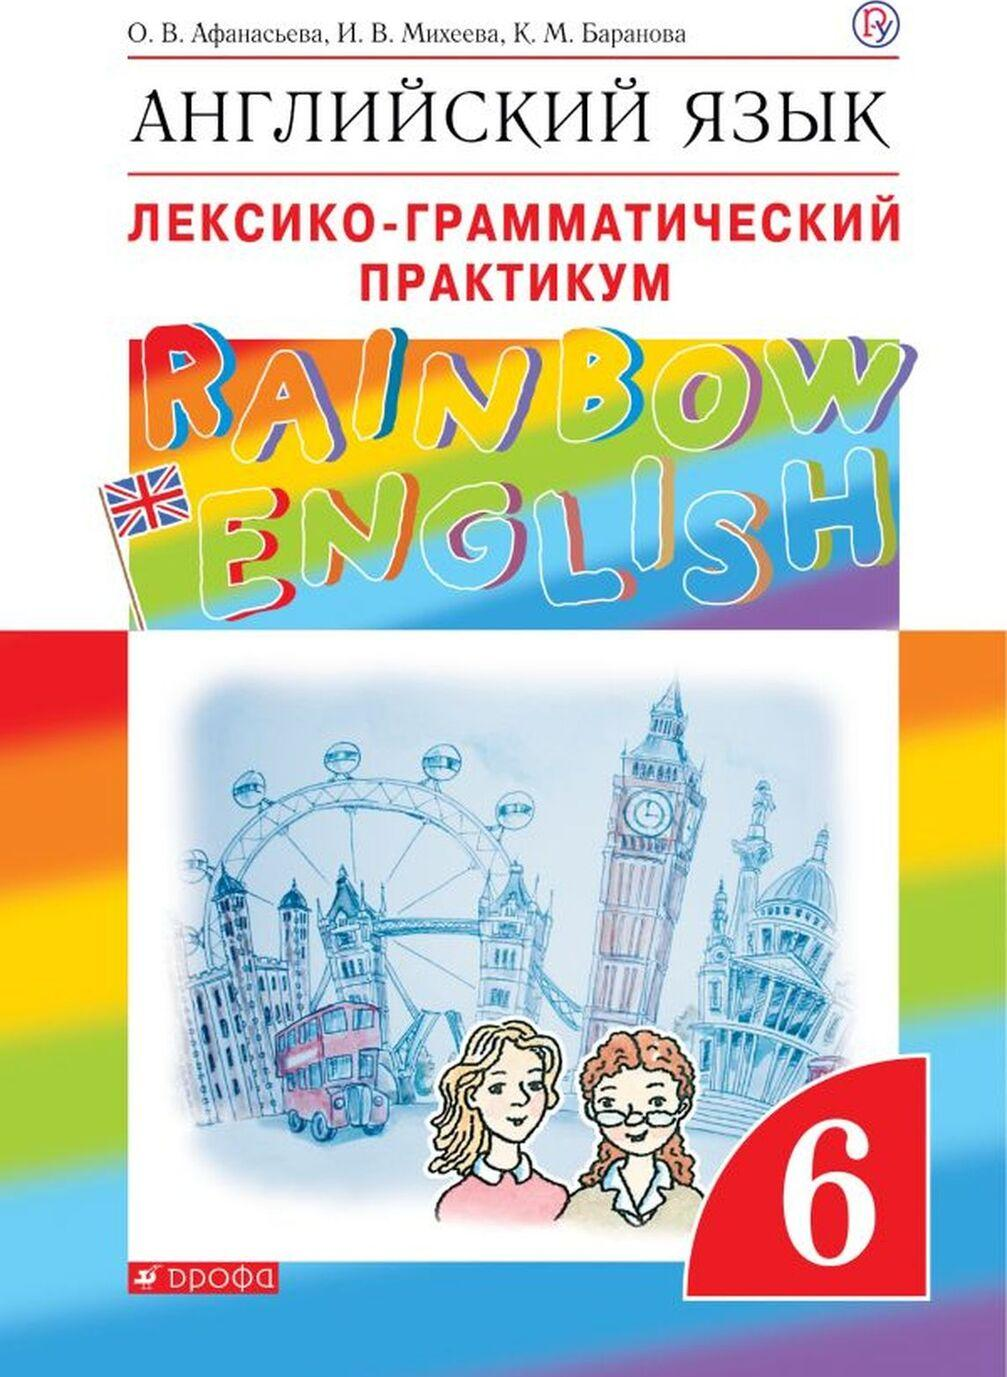 Anglijskij jazyk. 6 klass. Leksiko-grammaticheskij praktikum